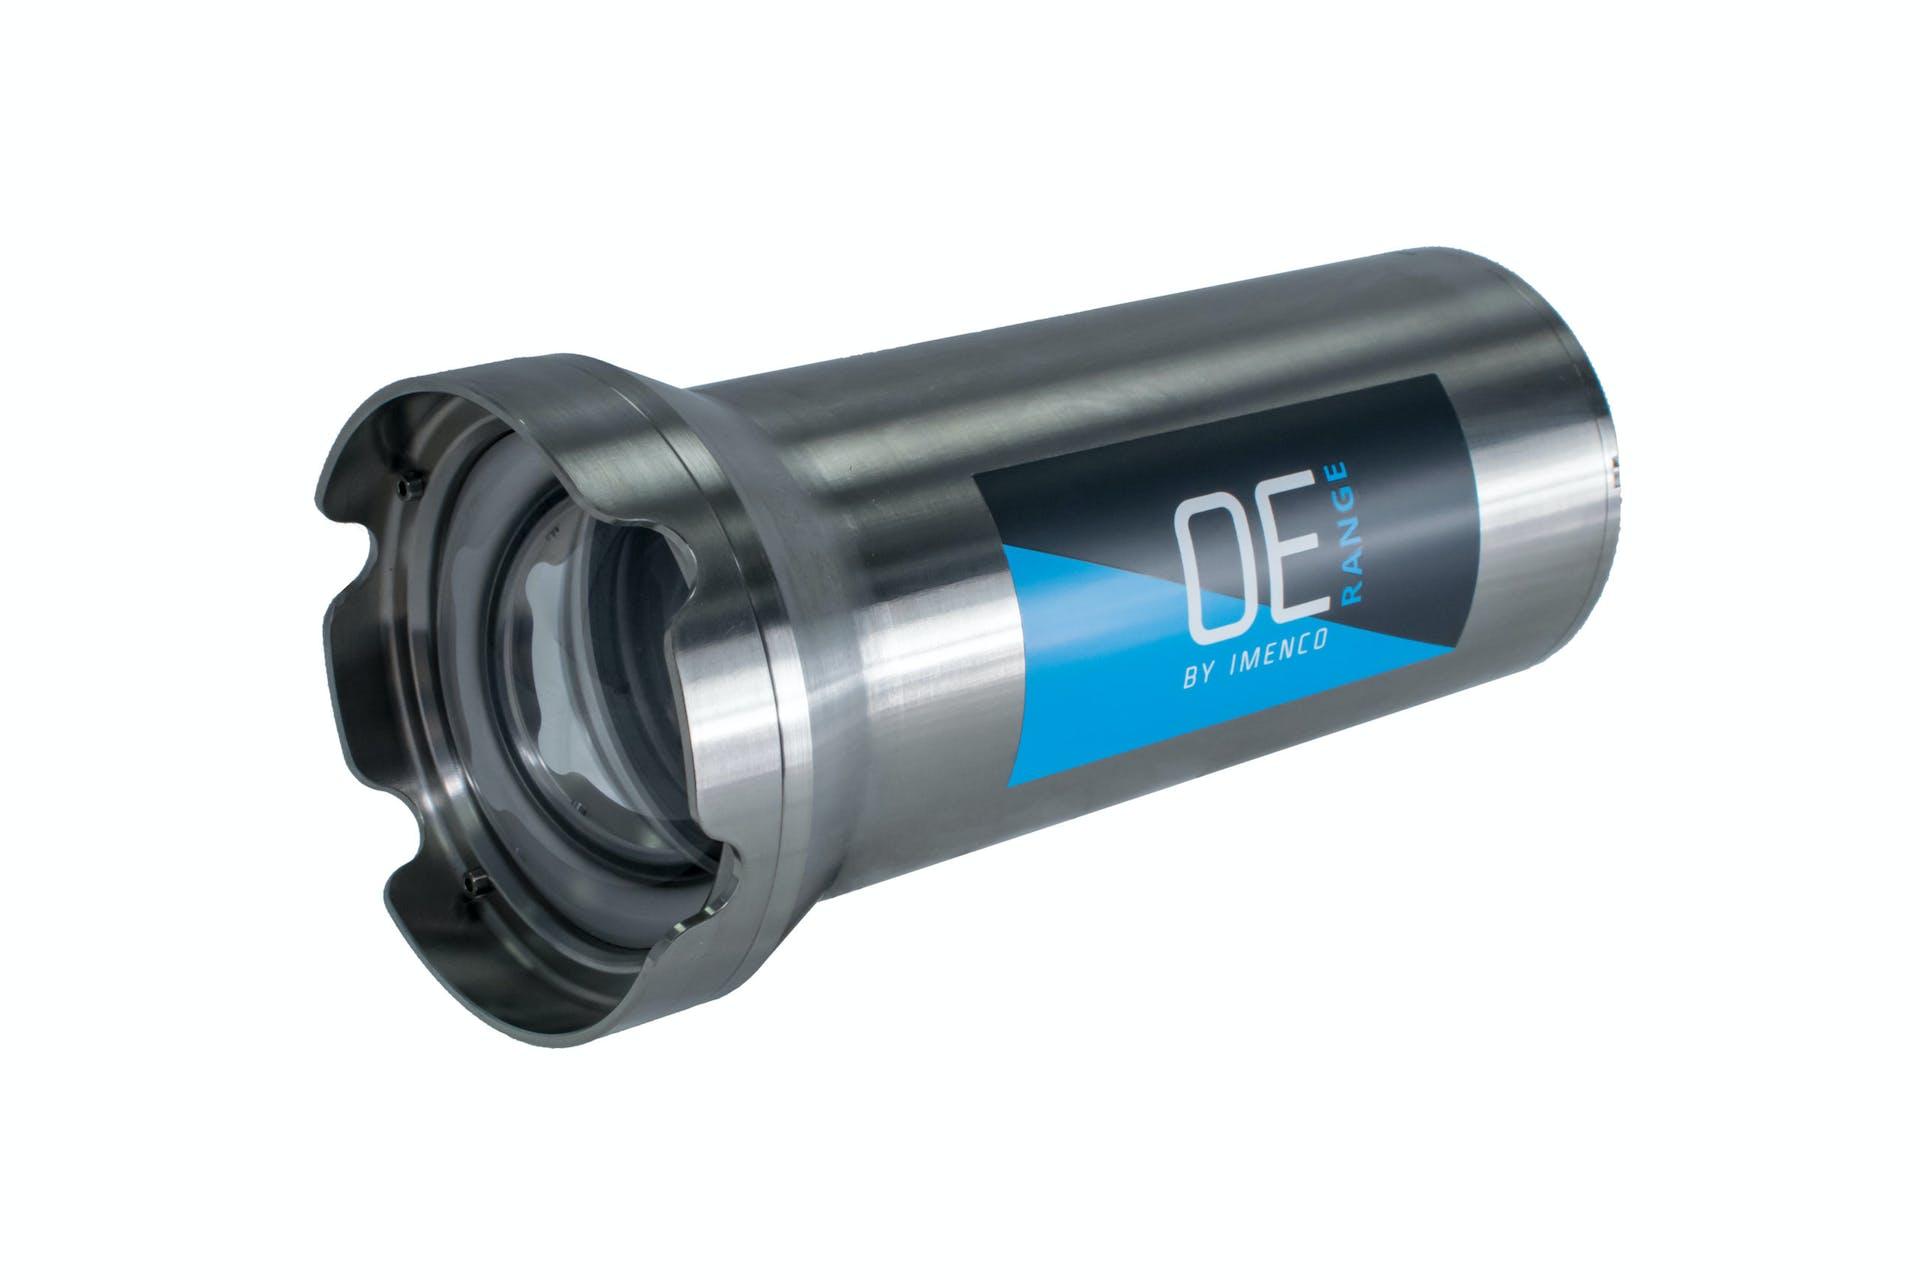 OE14-504 High Definition Wide Angle Colour Zoom Camera